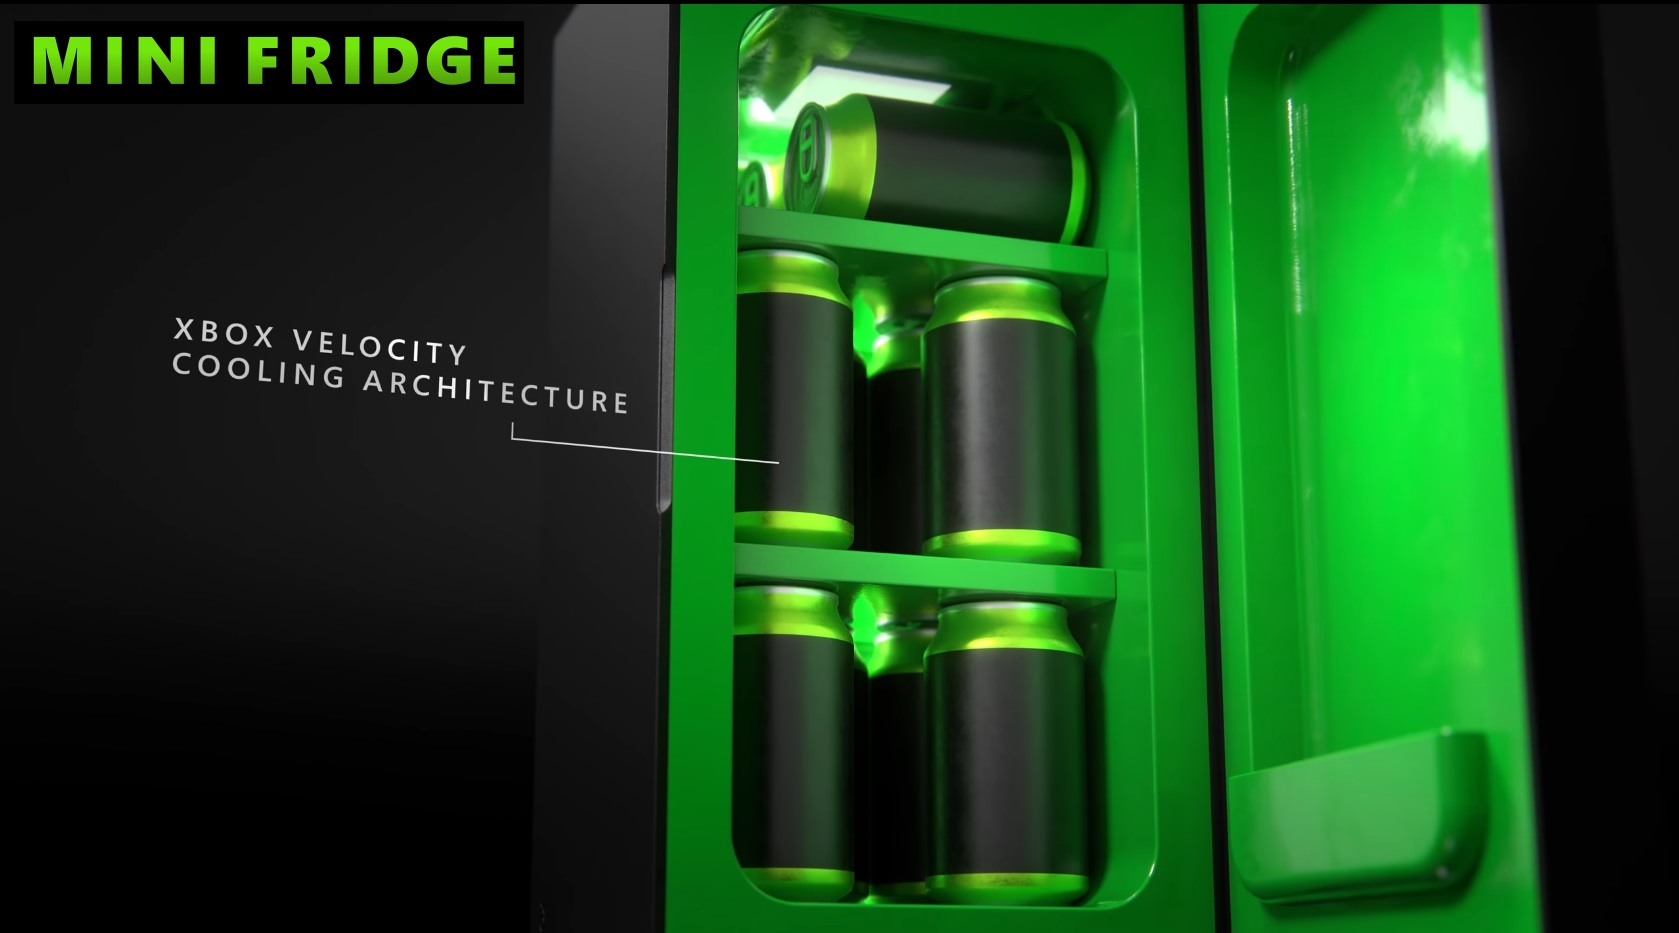 mini-fridge-1